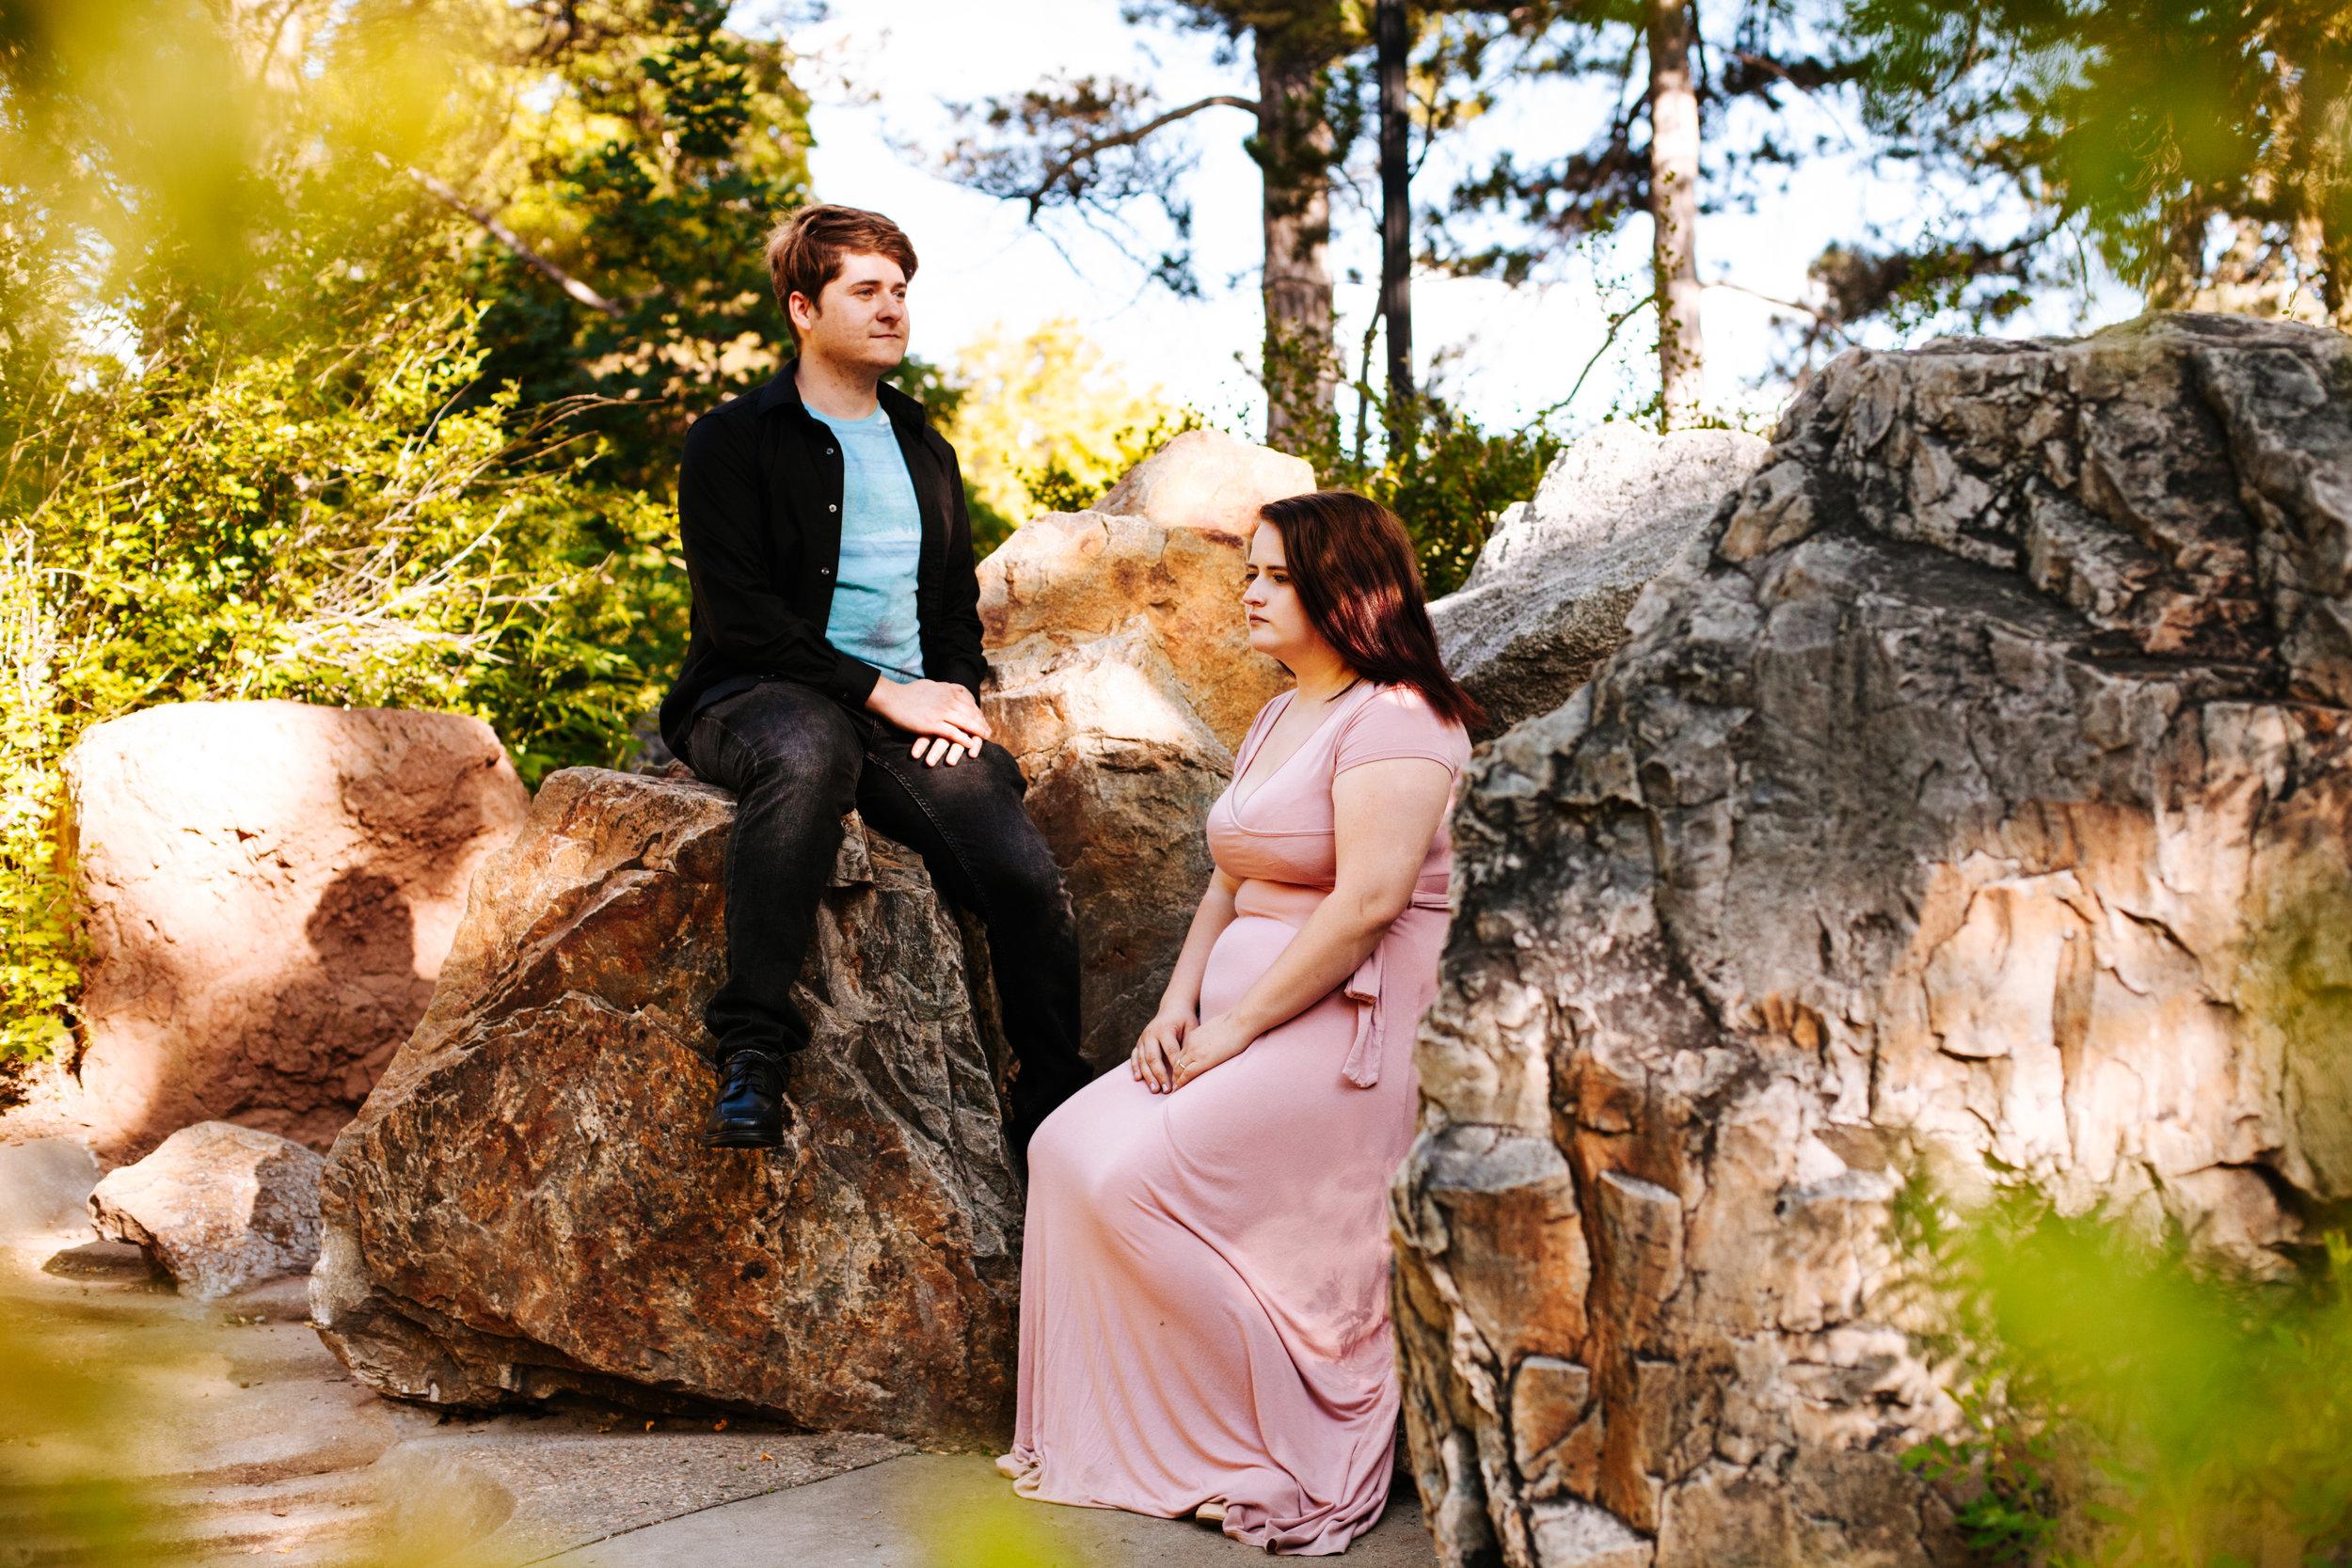 +Liberty Park +Utah Engagement Session +Salt Lake City Engagement Photographer +Utah Wedding Photographer +Marina Rey Photo-9505.jpg